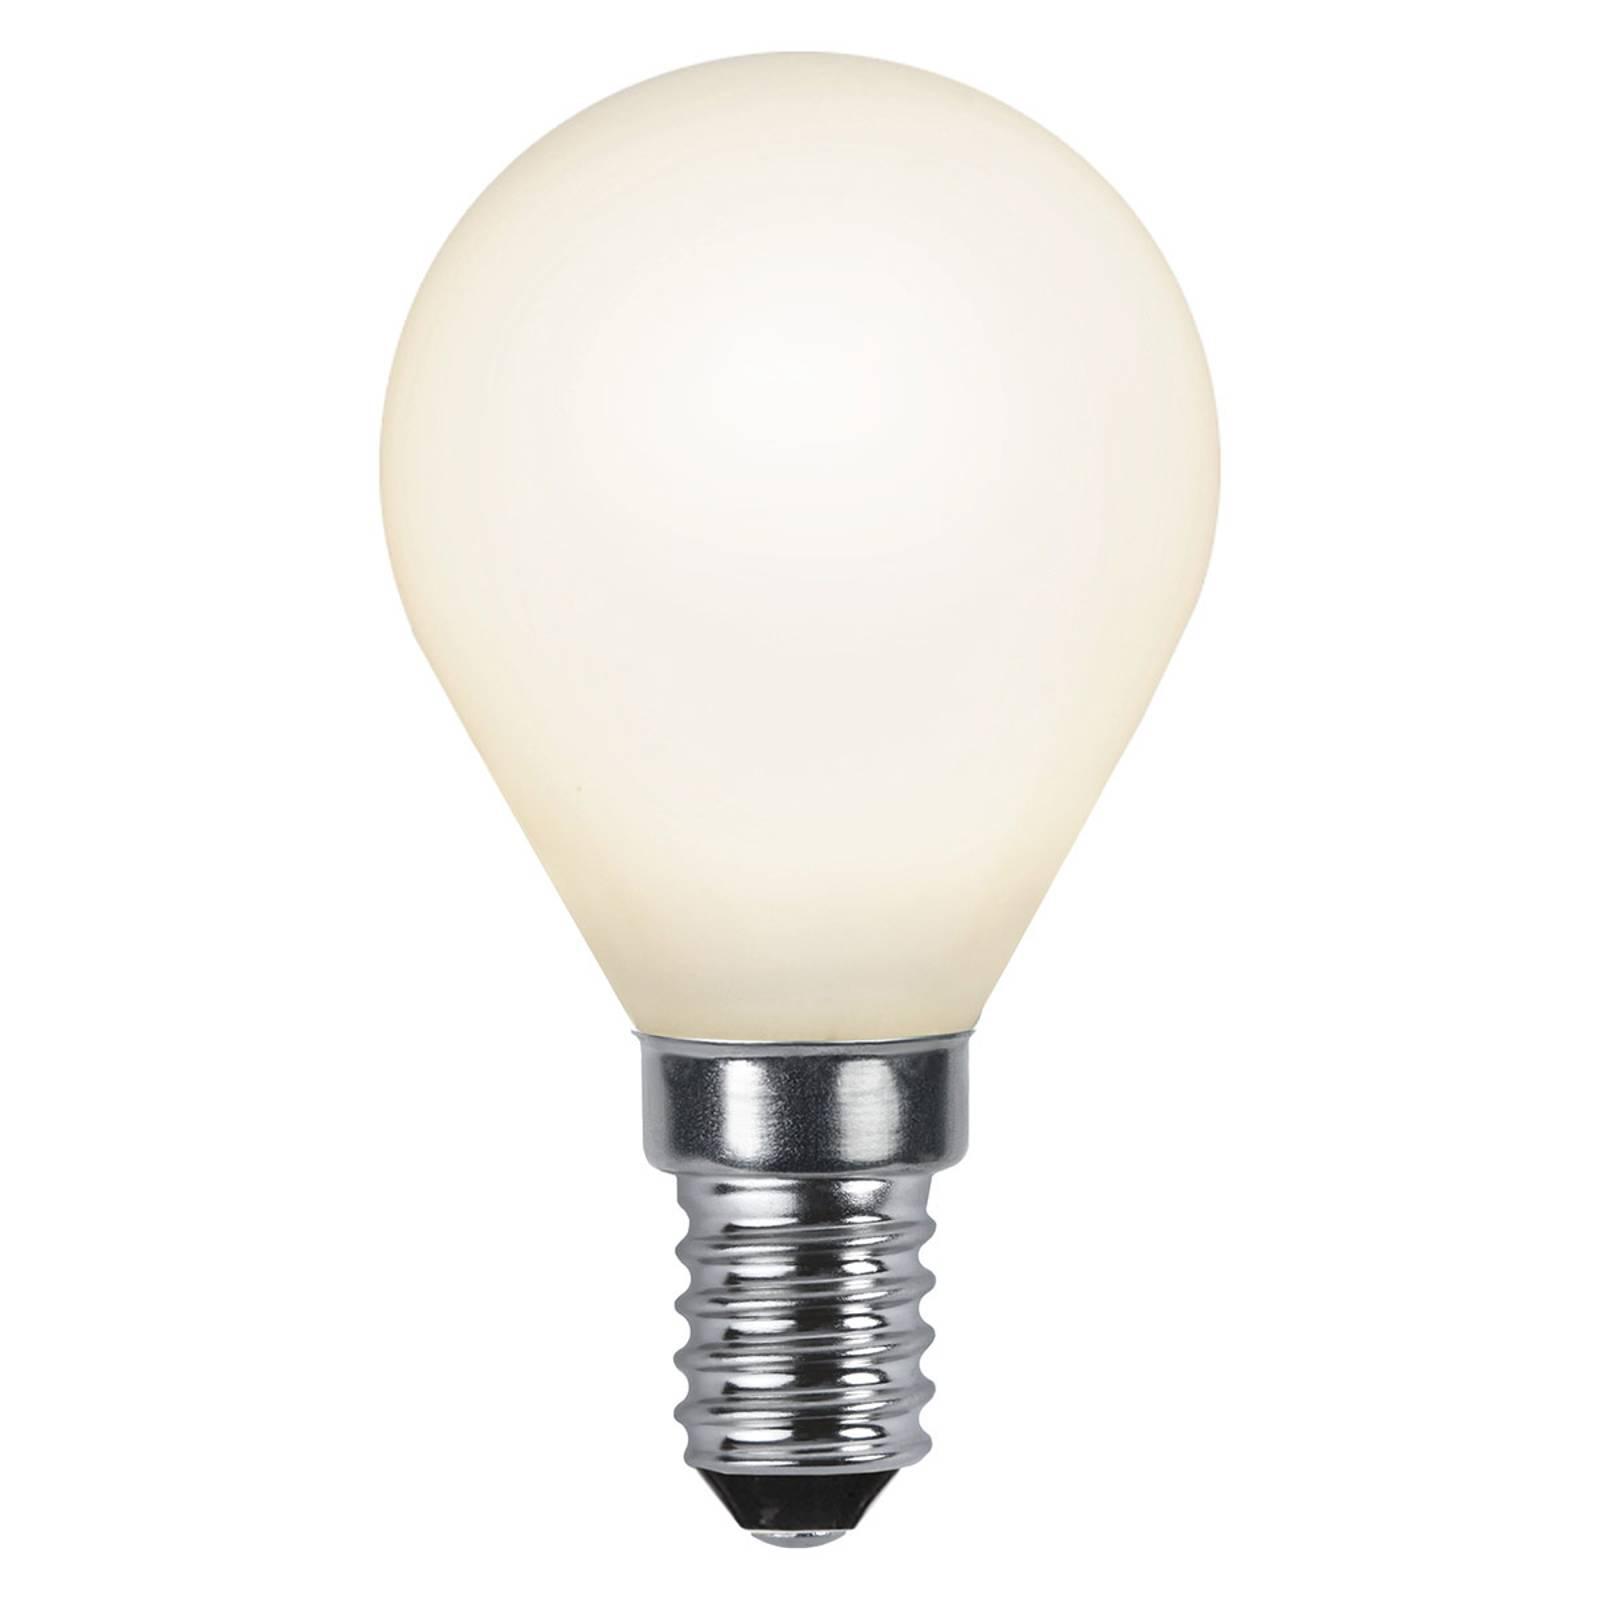 LED-pisaralamppu E14 2 700 K opaali Ra90 4,7W